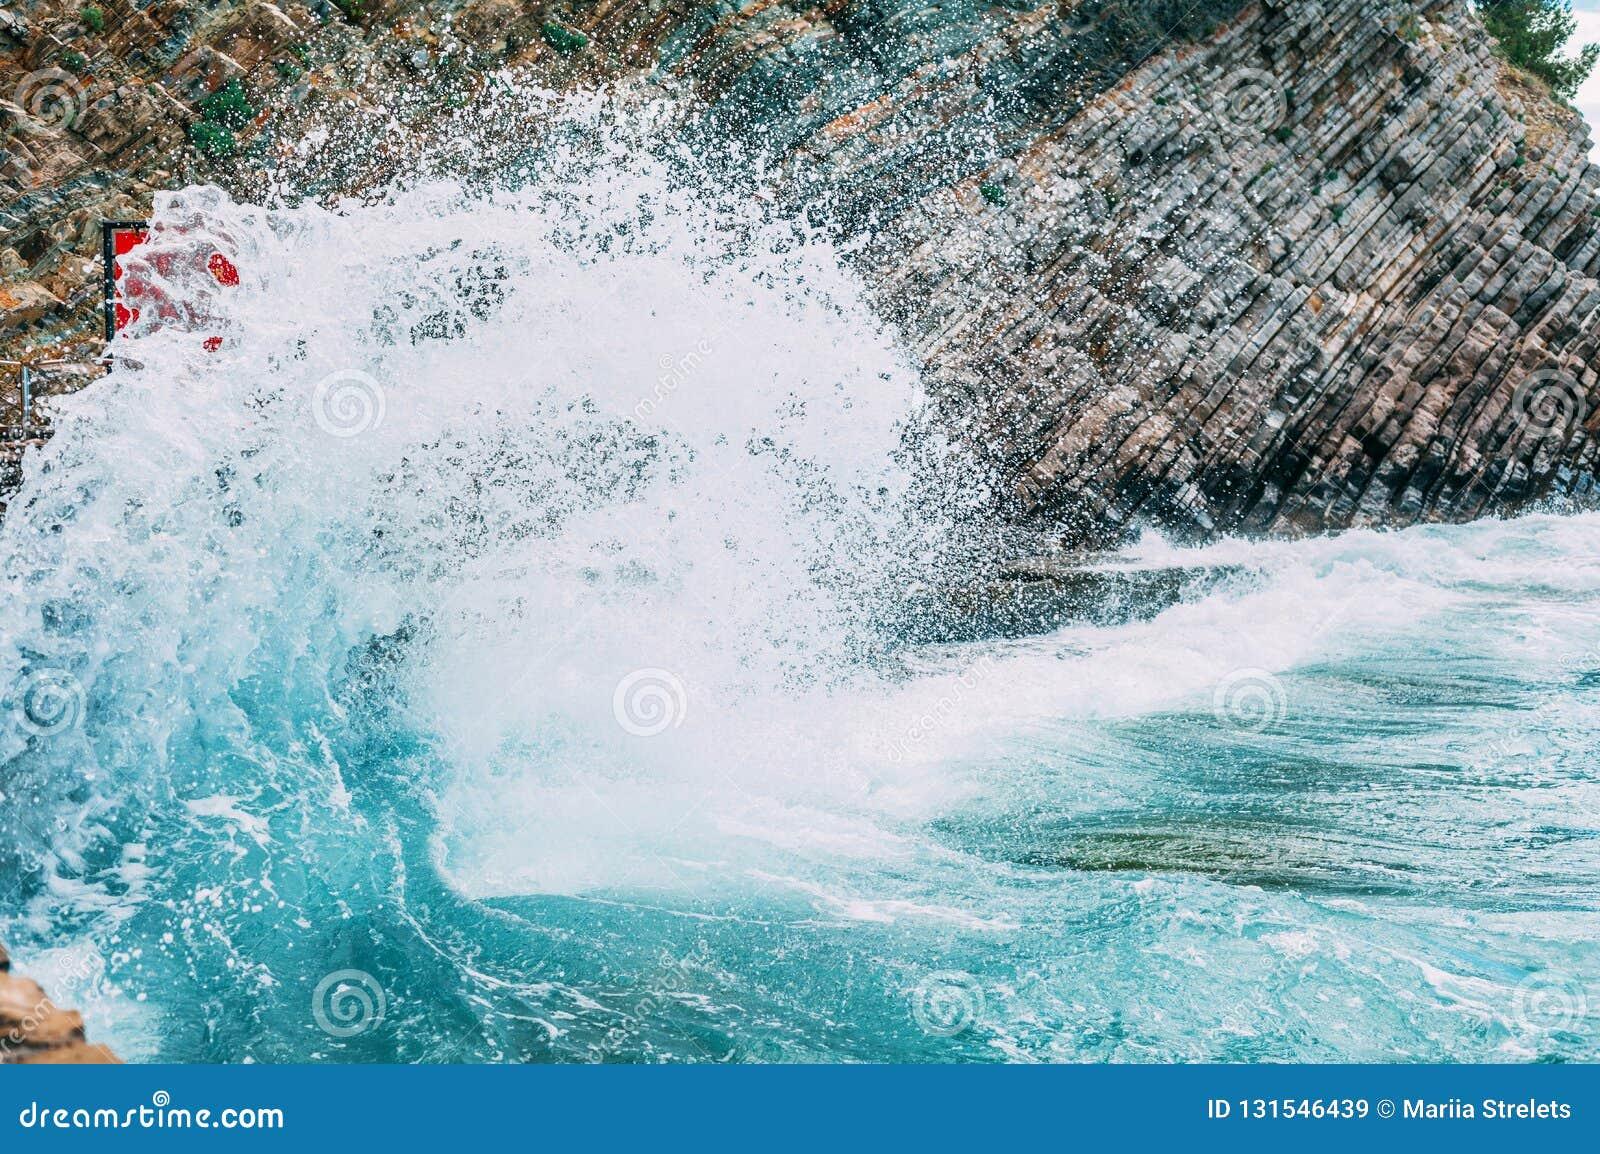 Big wave beats on the rocks